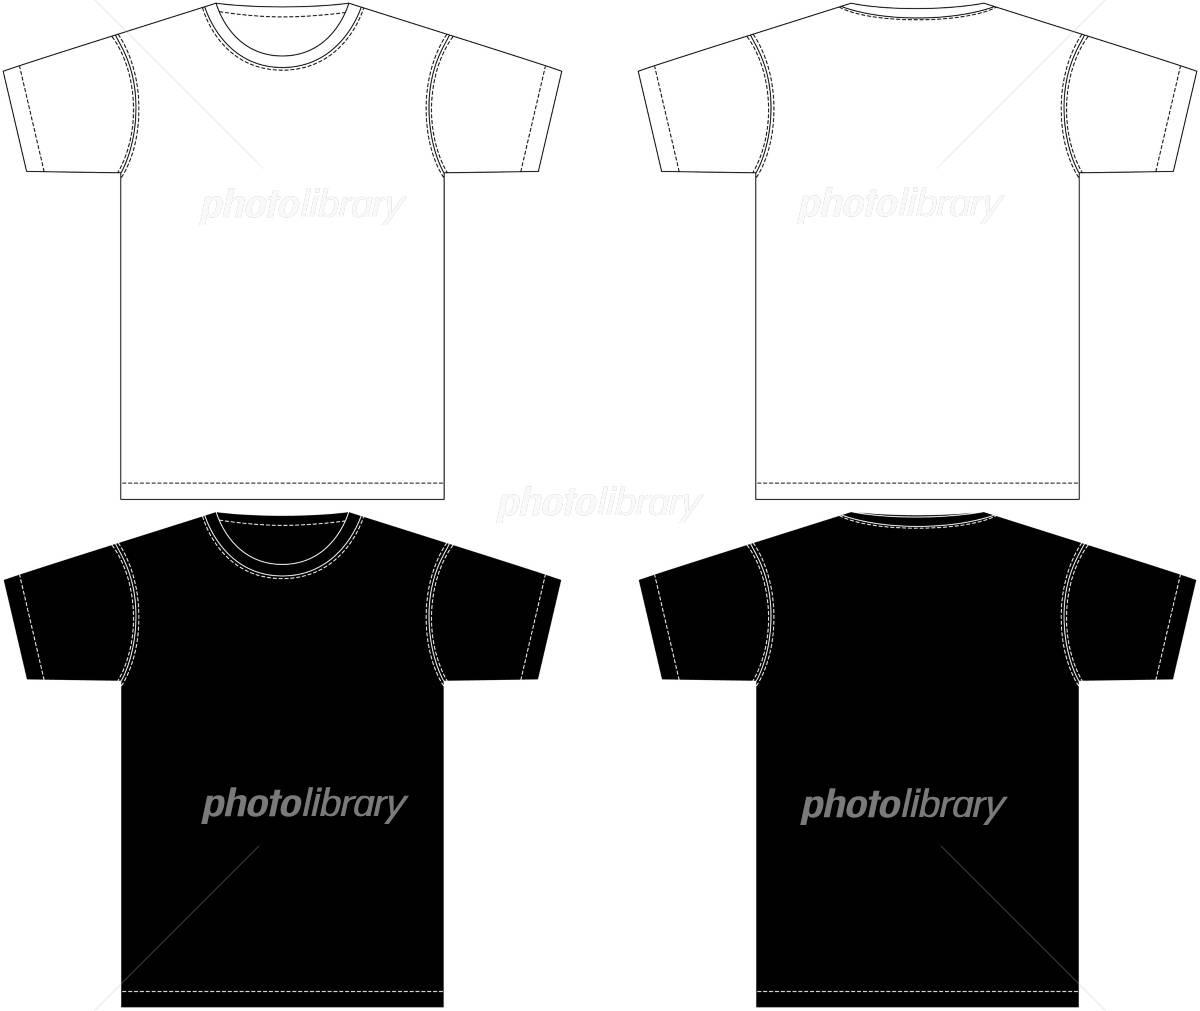 Tシャツ モック イラスト素材 869792 フォトライブラリー Photolibrary